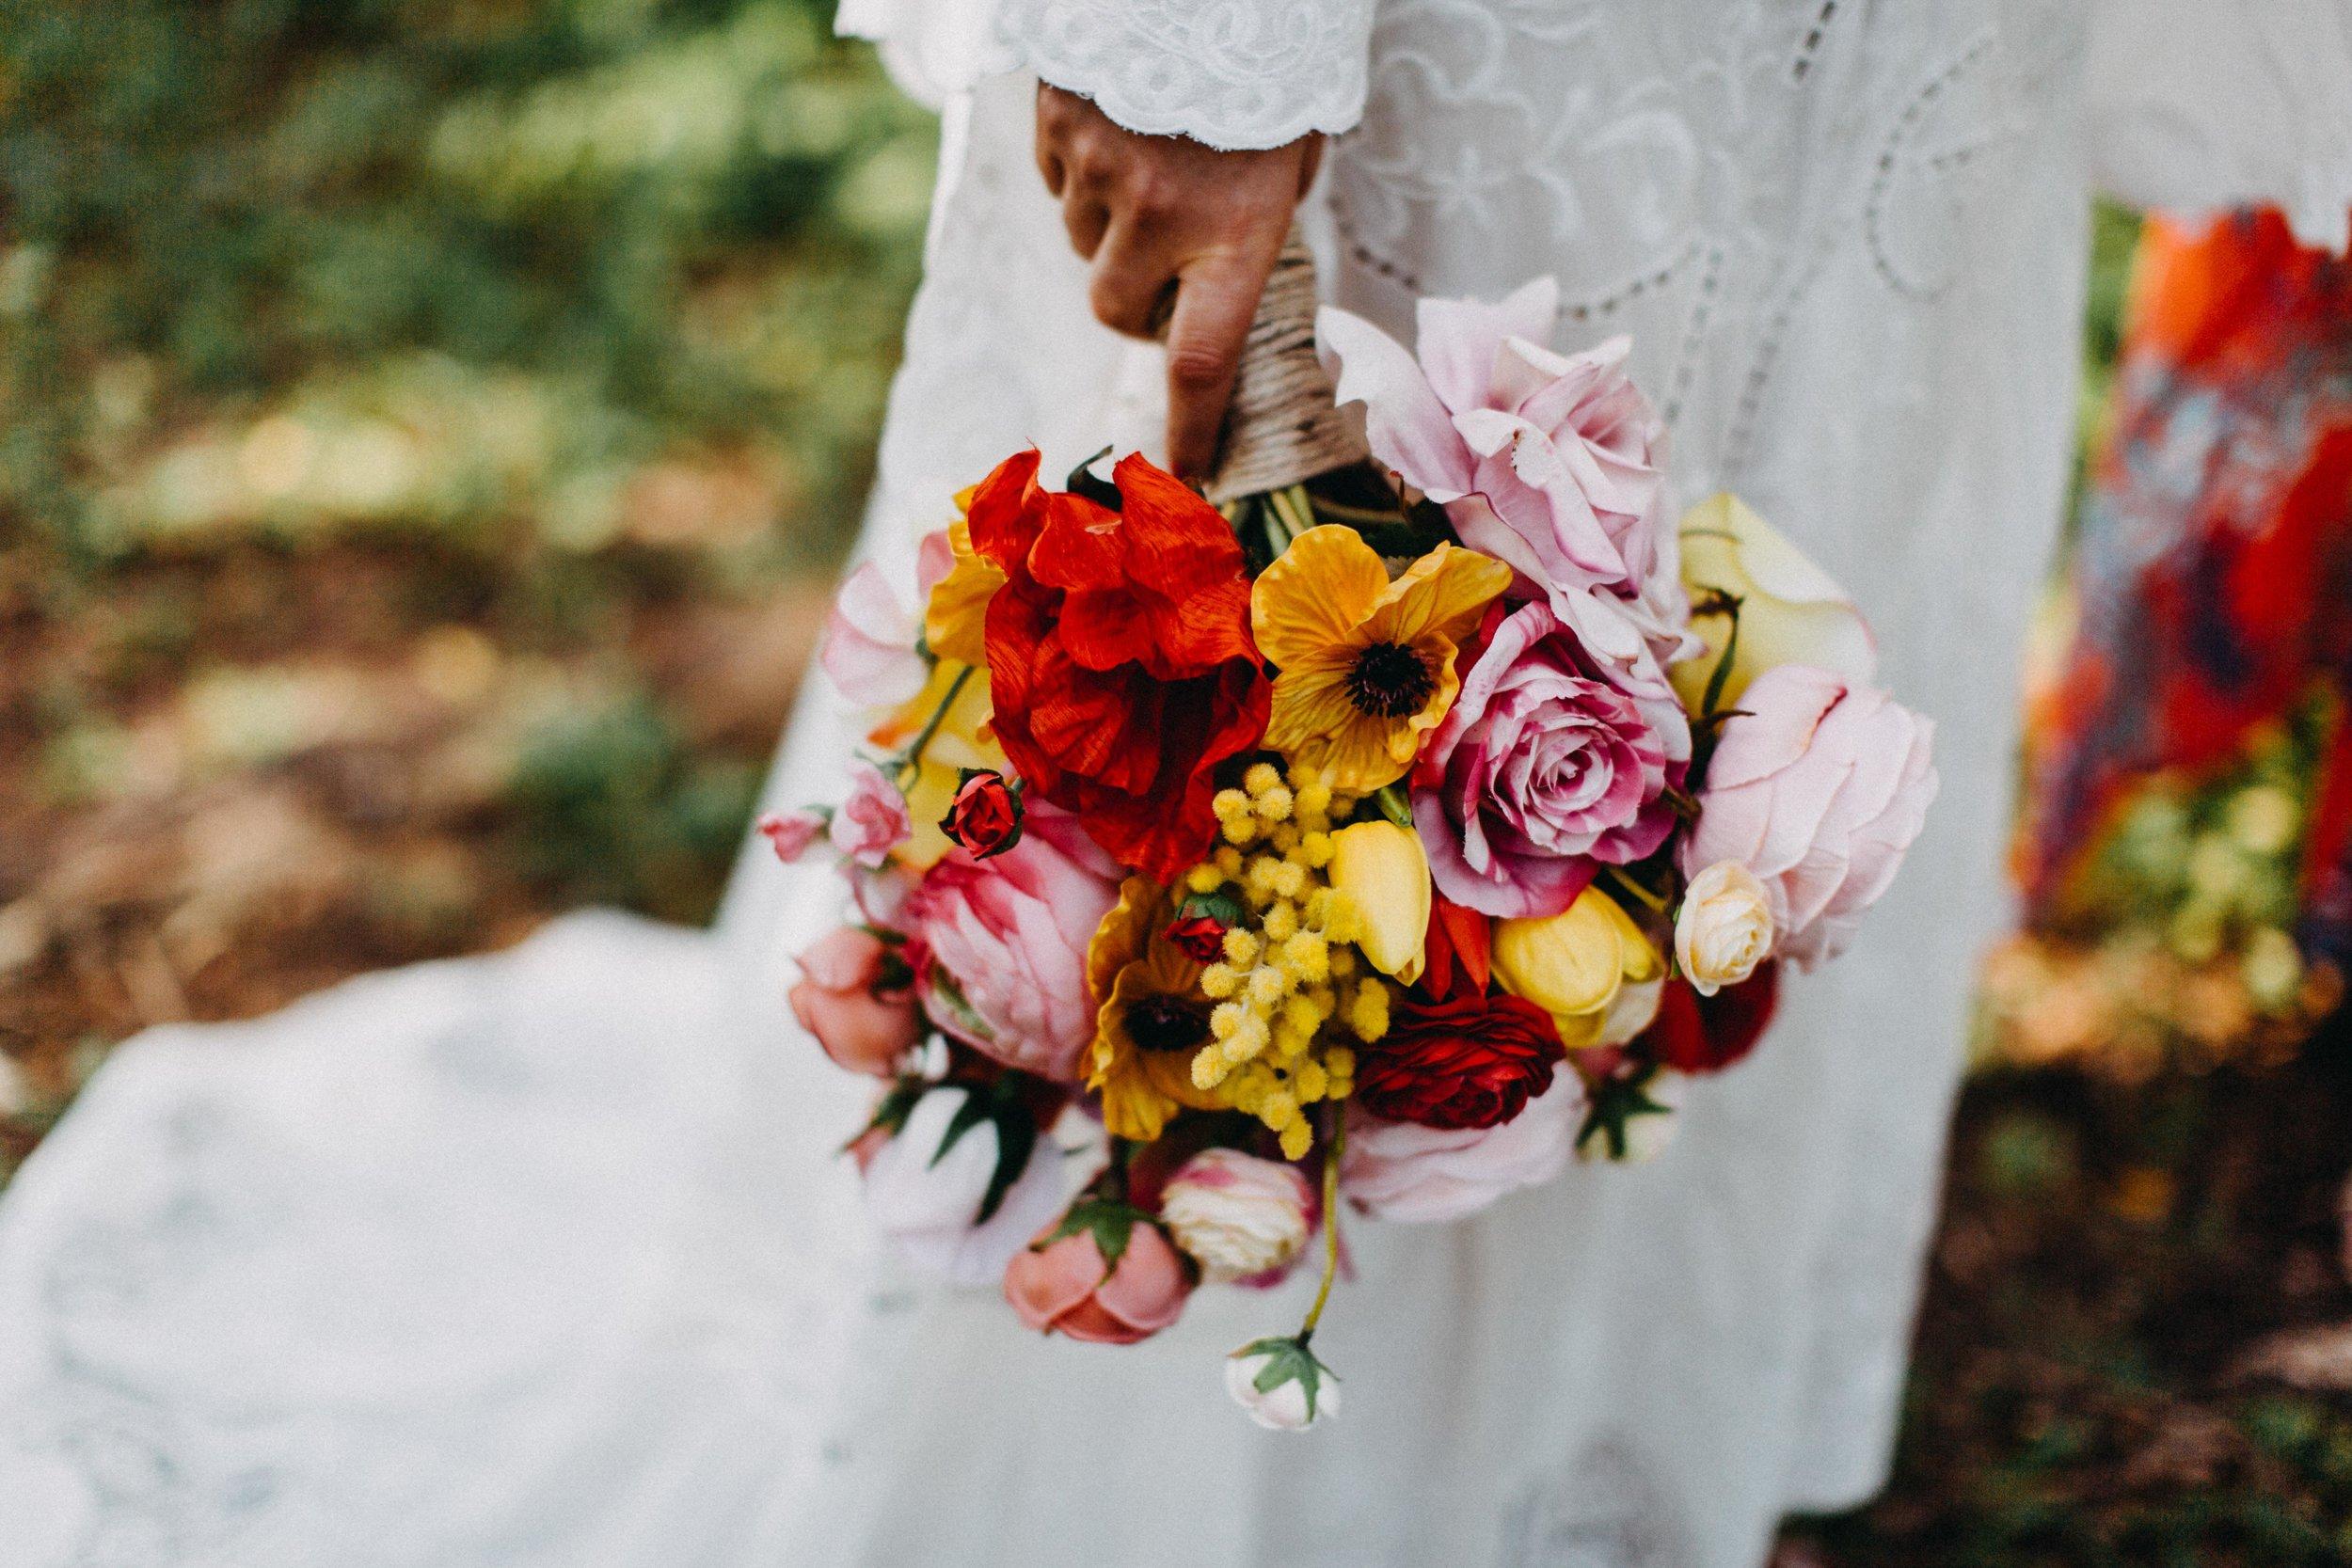 darwin-elopement-wedding-beach-camden-photography-www.emilyobrienphotography.net-9.jpg